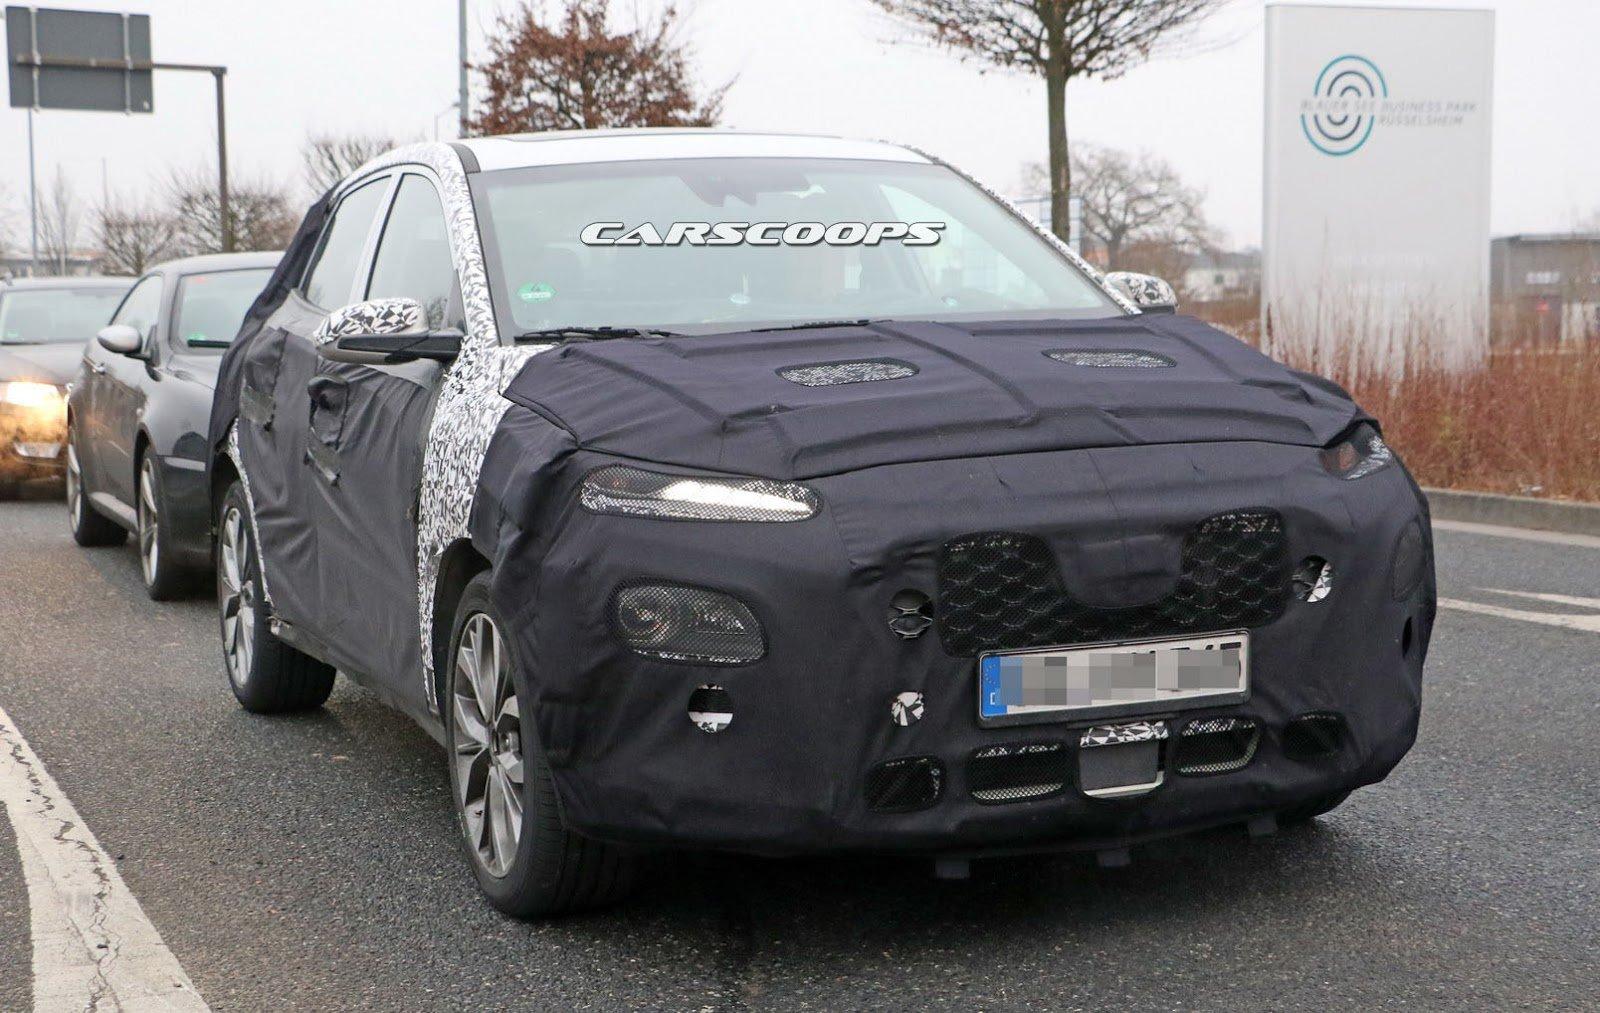 Hyundai SUV Spyshot